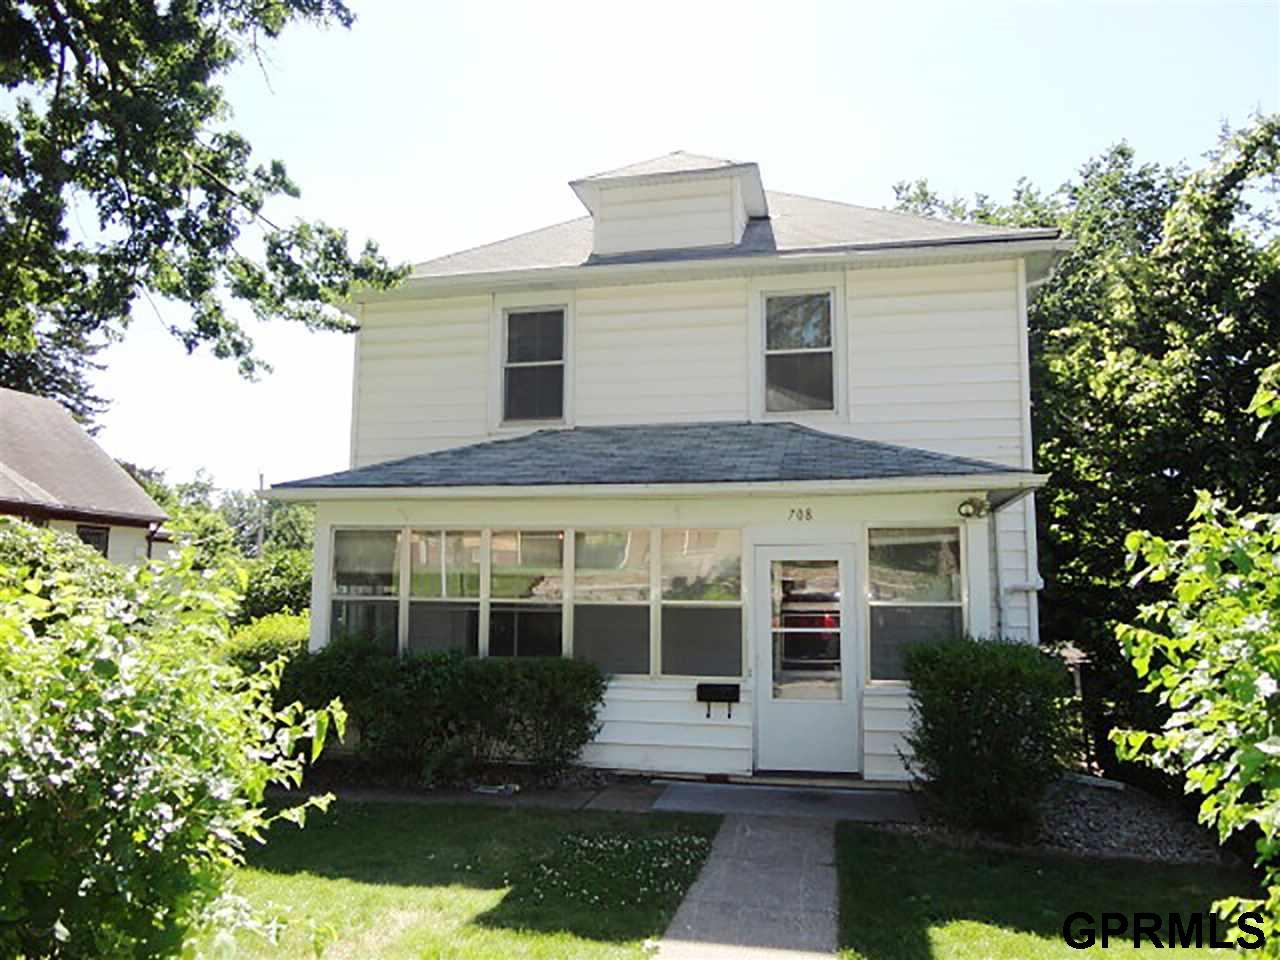 Rental Homes for Rent, ListingId:32957667, location: 708 N 41st Omaha 68131